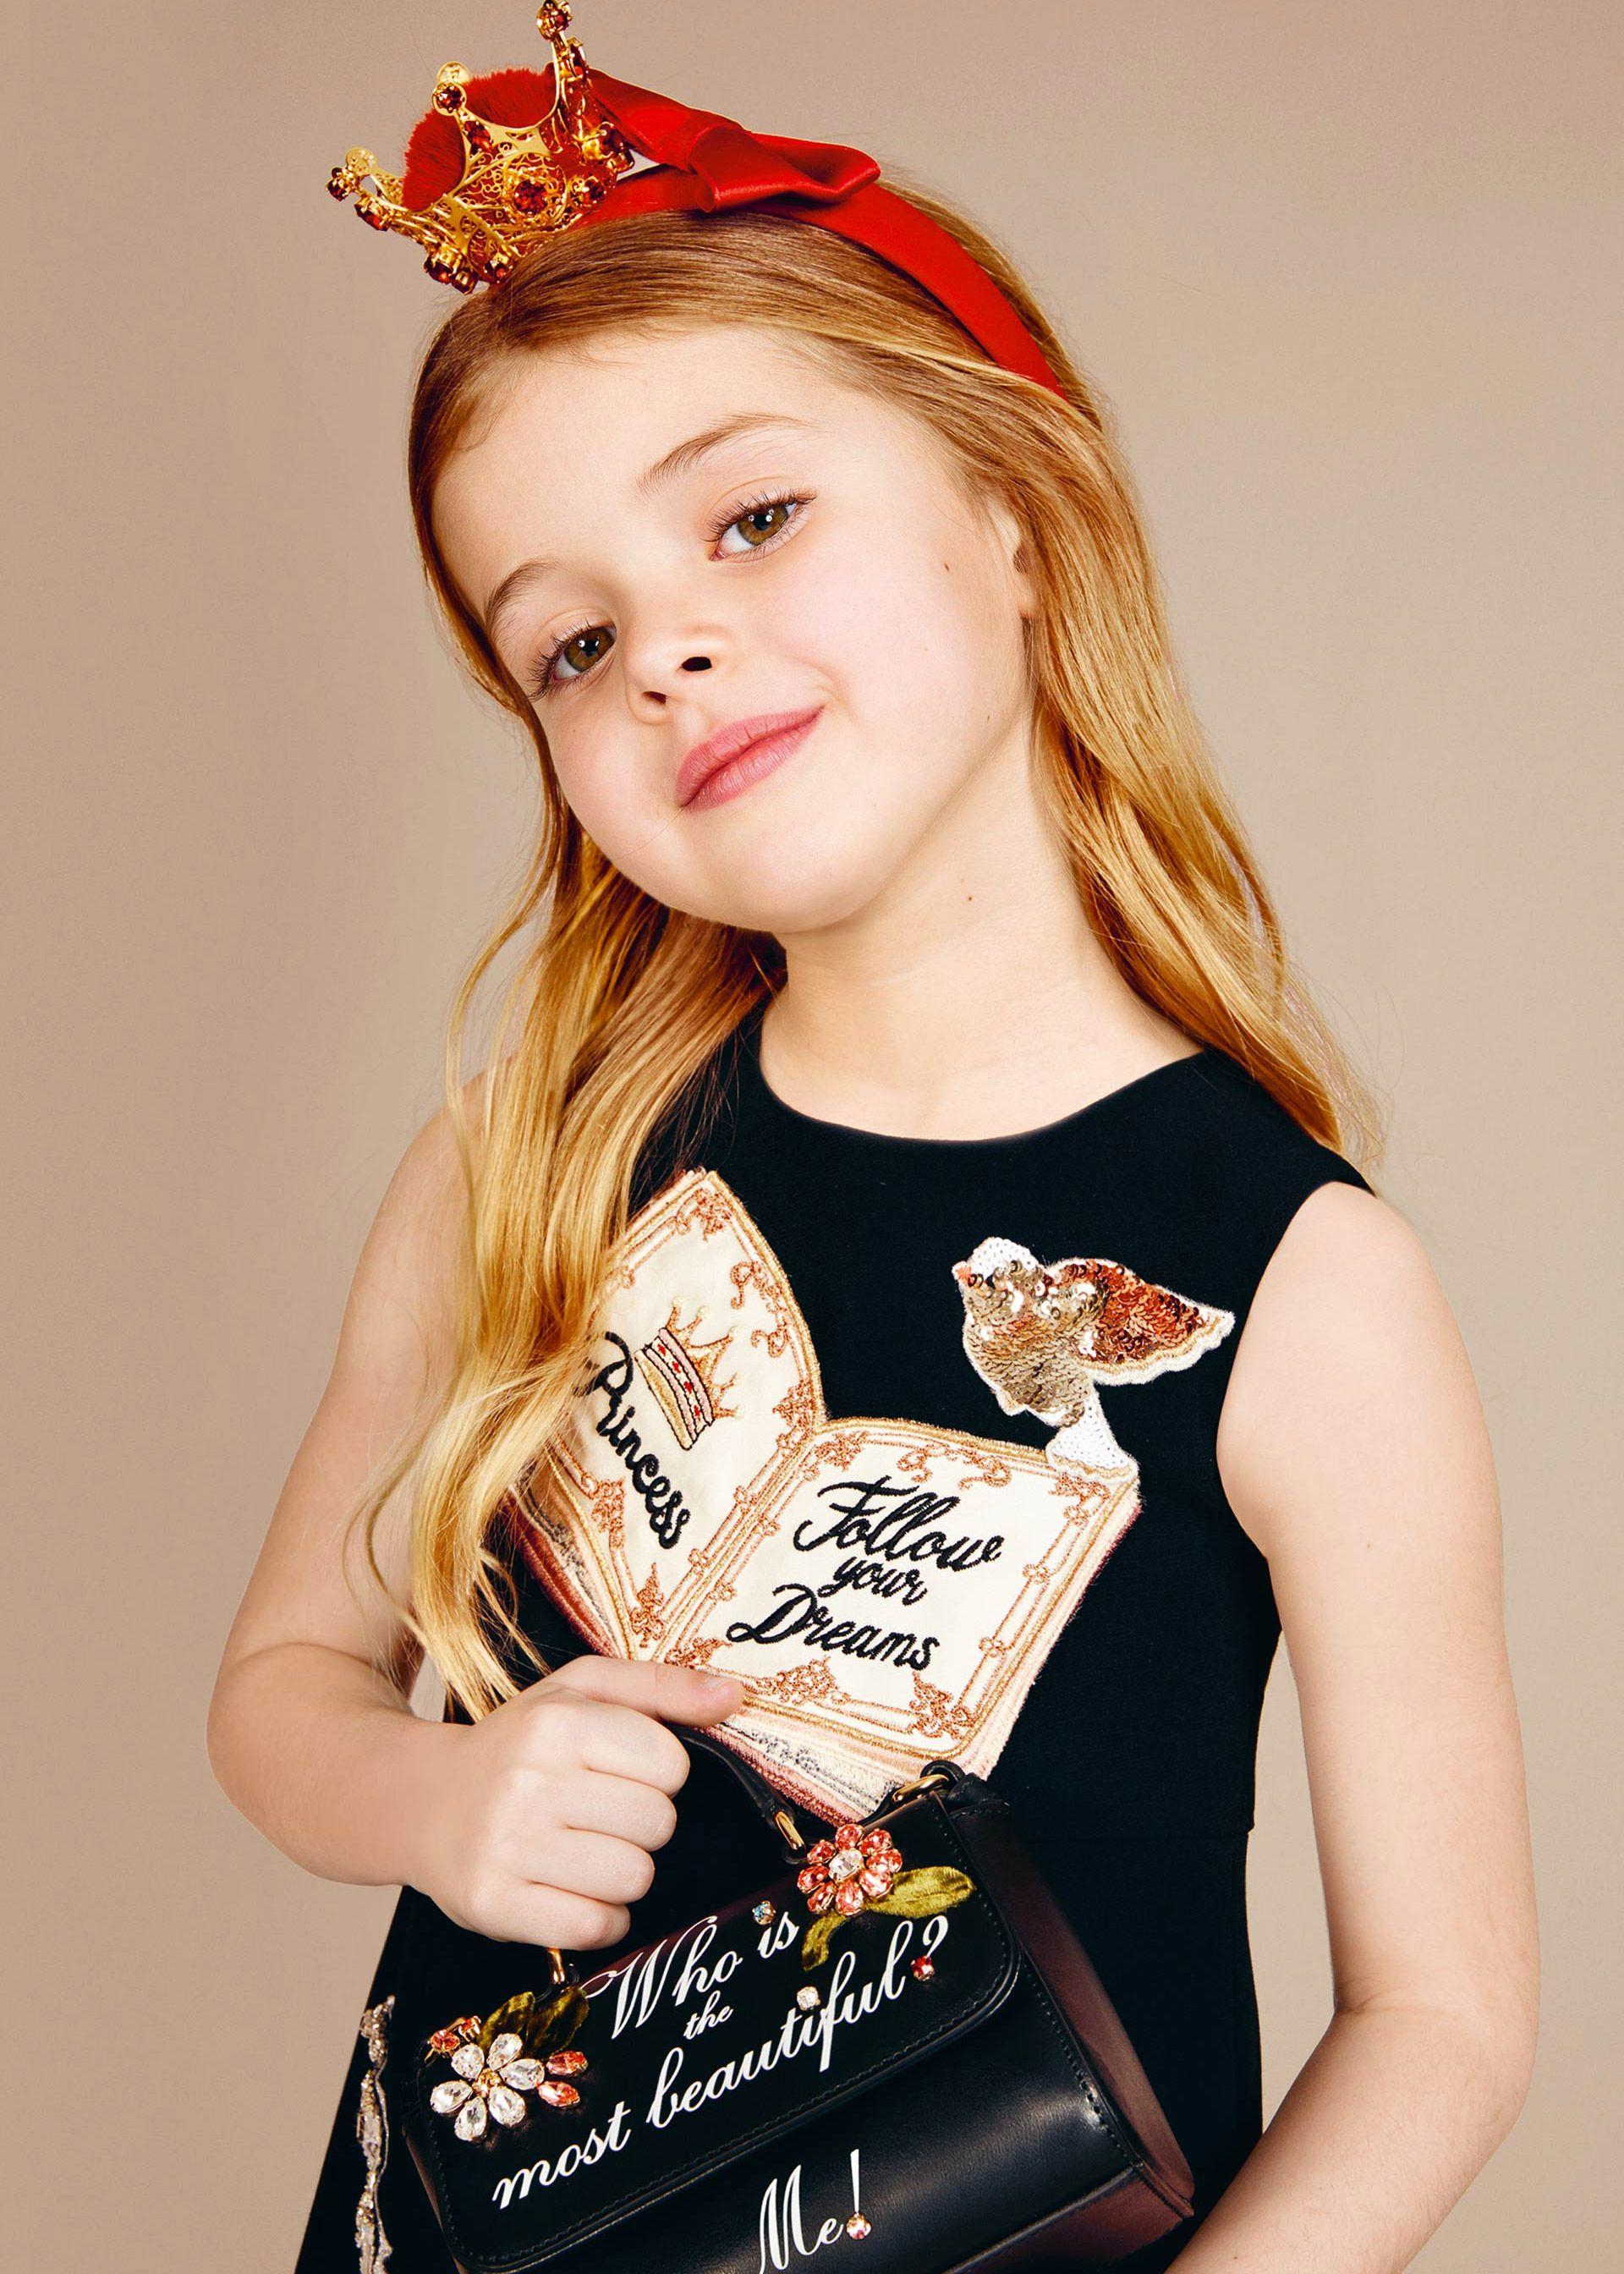 Dolce   Gabbana Collezione Bambino Autunno Inverno 2016 2017  Bambina  56913a37691